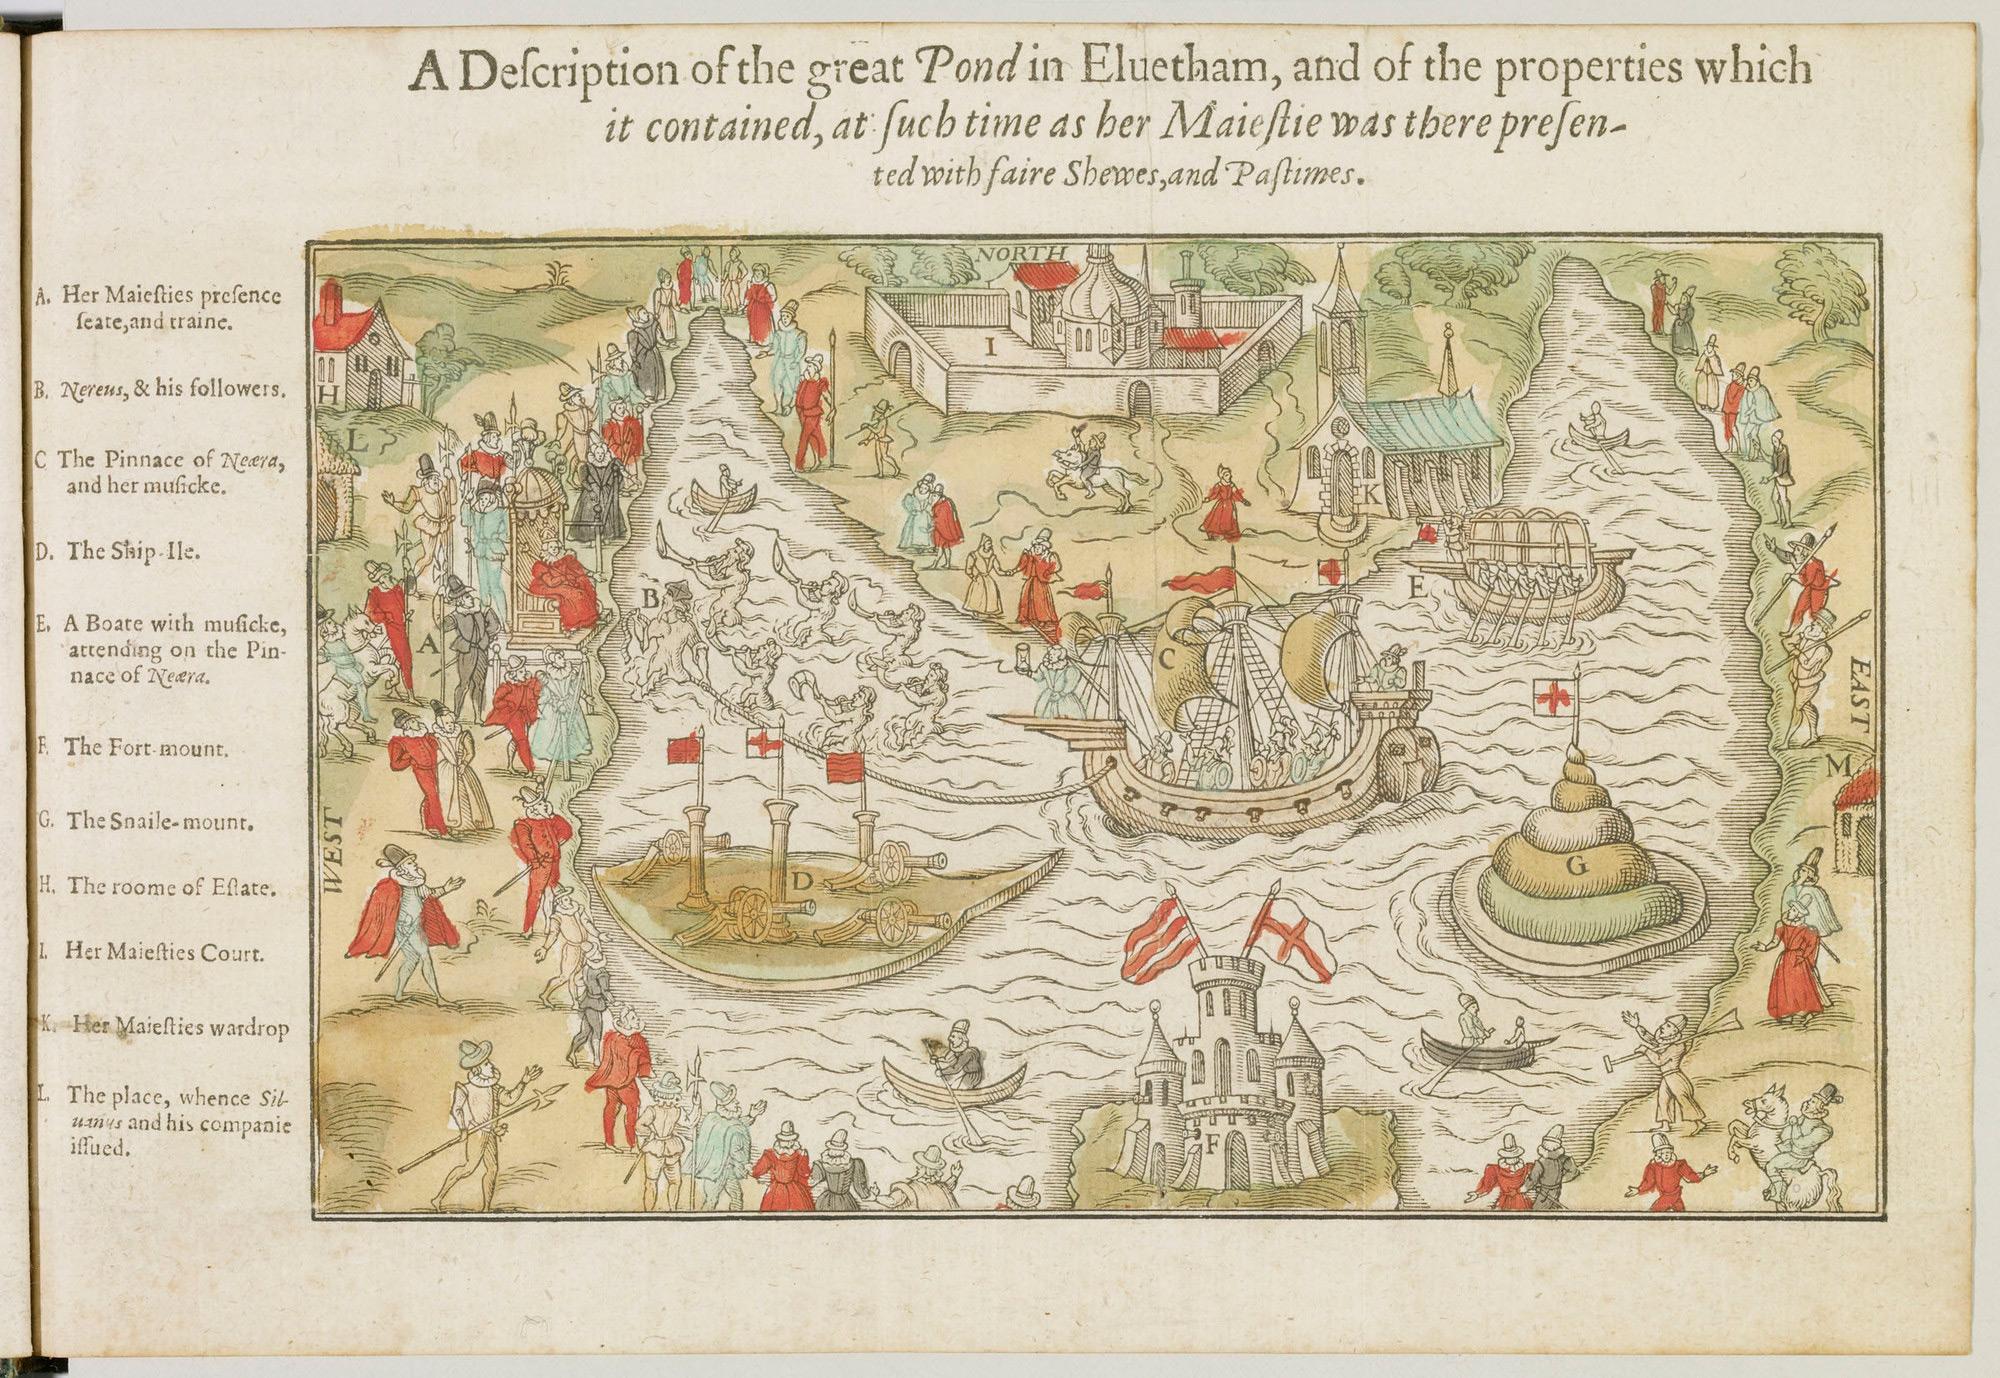 An Entertainment for Elizabeth I at Elvetham, 1591